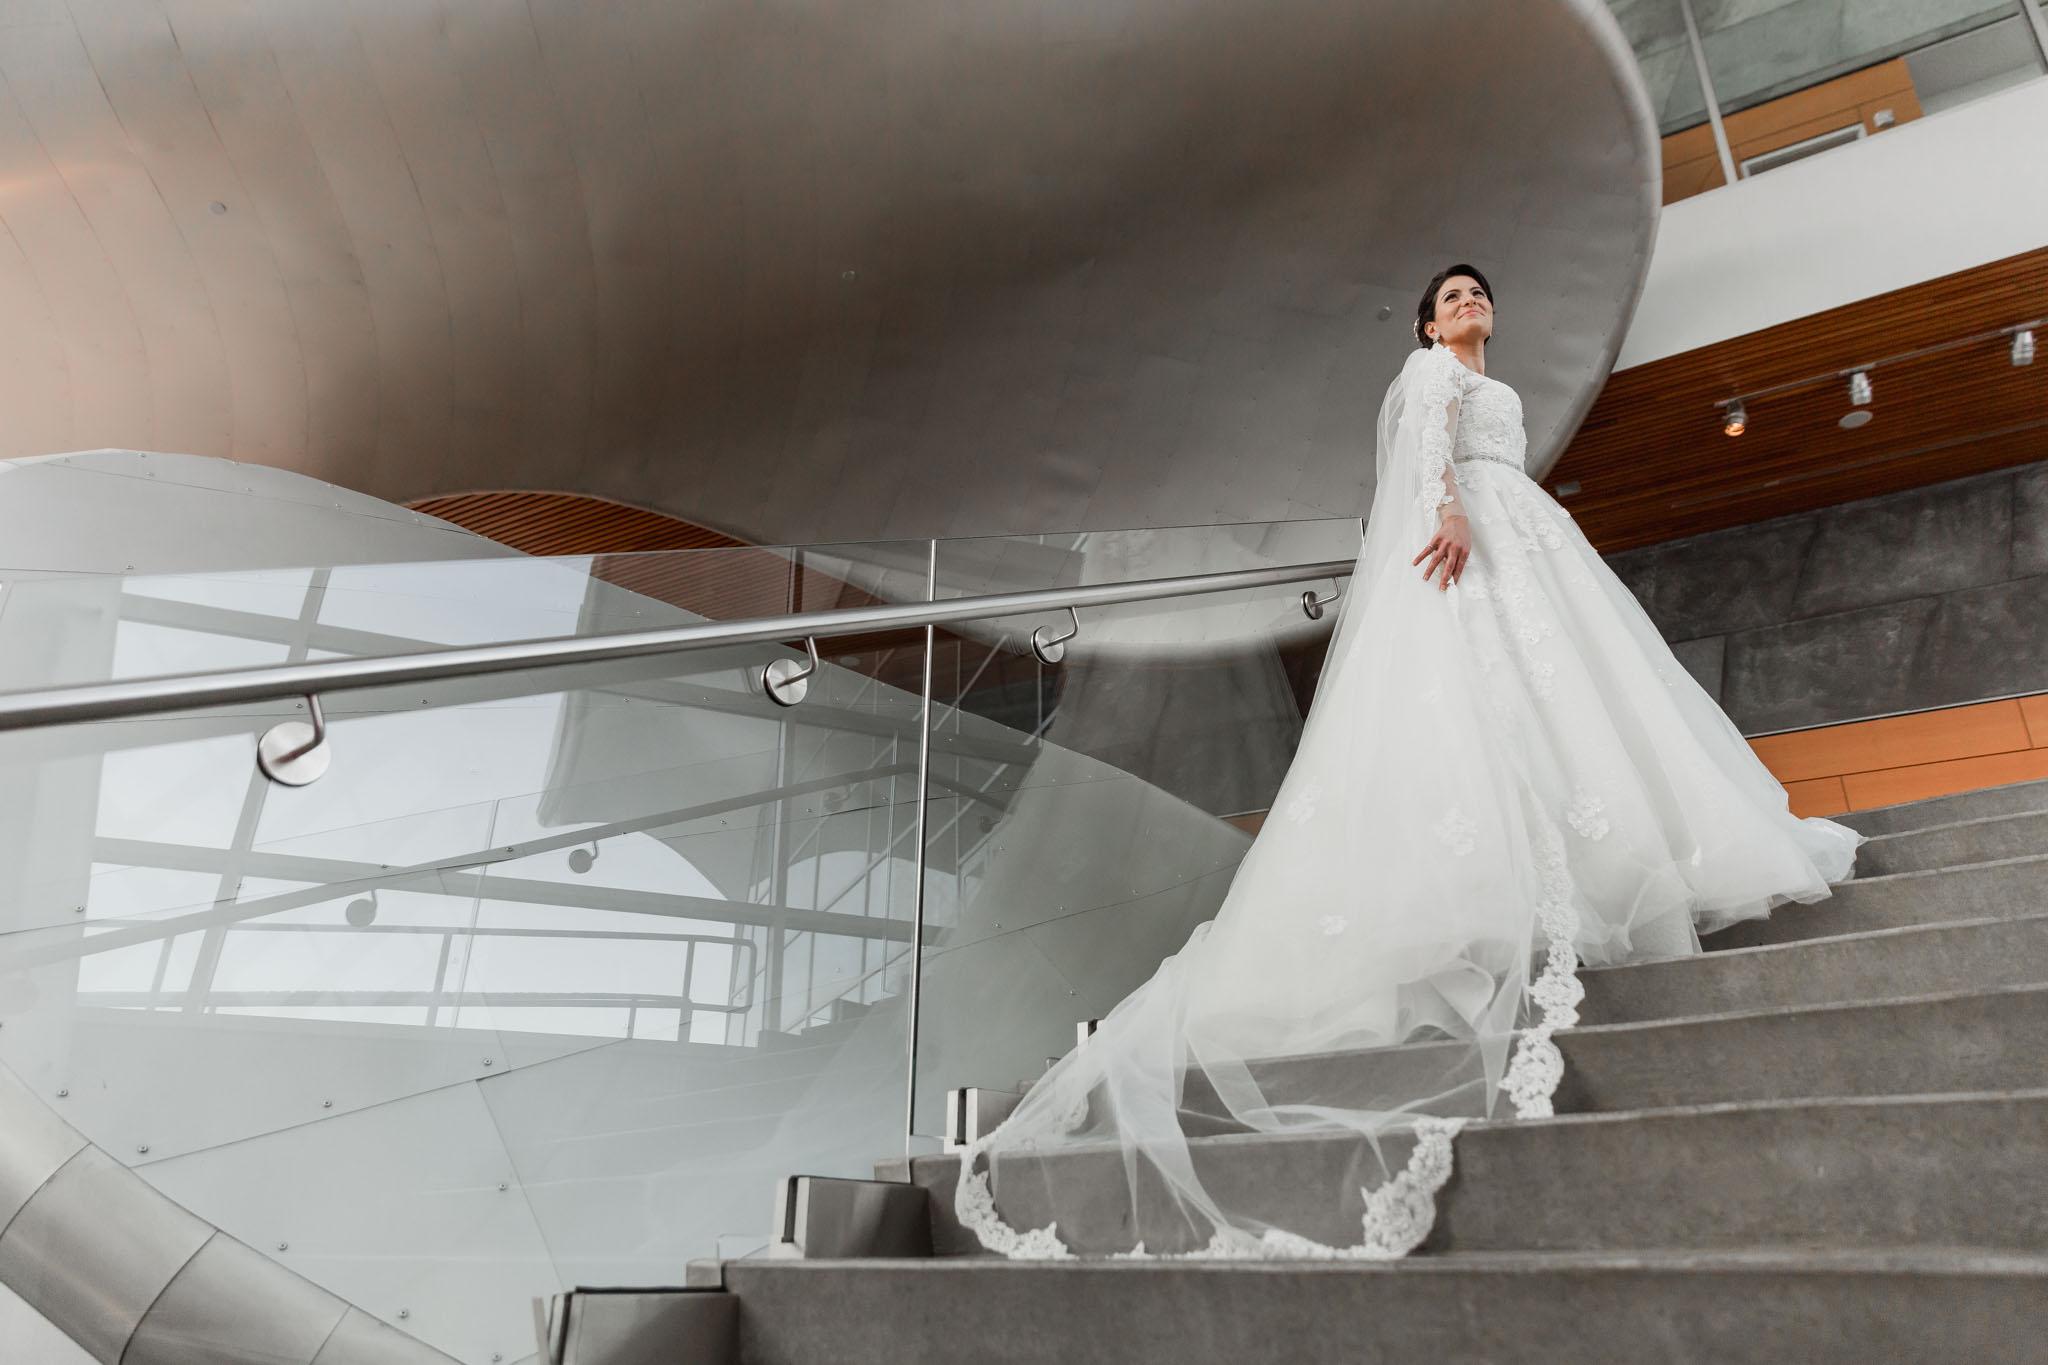 Wedding Photos Taken in Edmonton